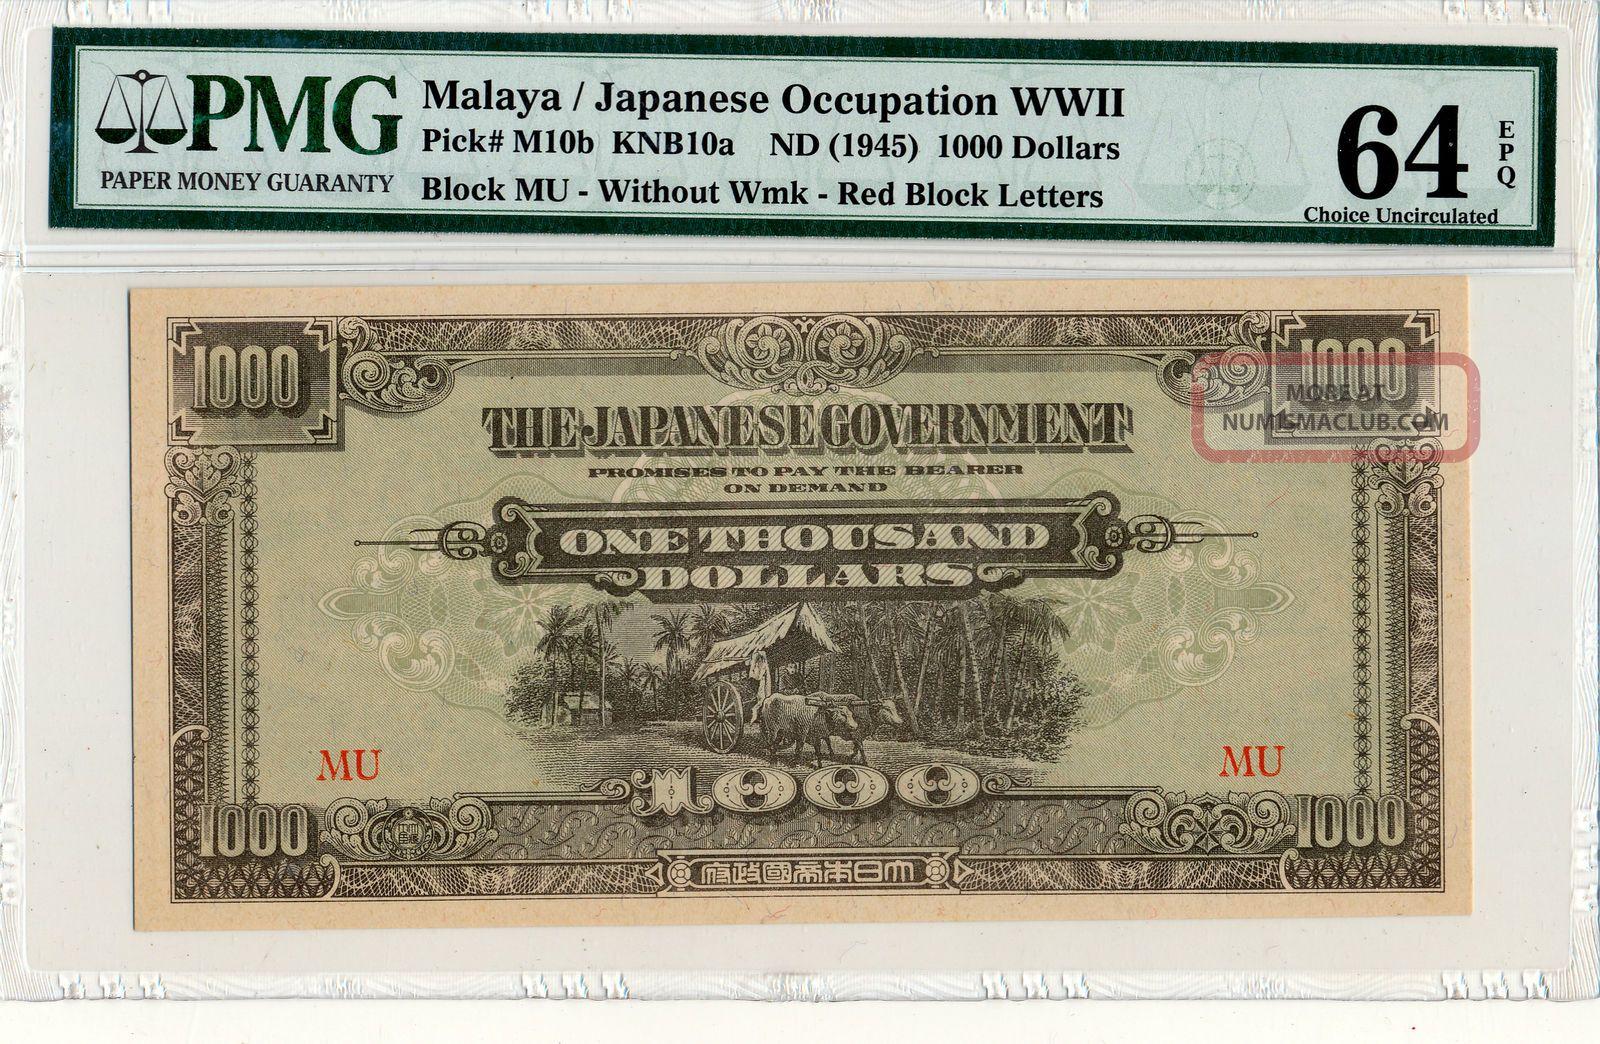 japanese occupation on malaya [t]he japanese occupation lacked documentation  [2] paul kratoska, the  japanese occupation of malaya (london: hurst & company,.